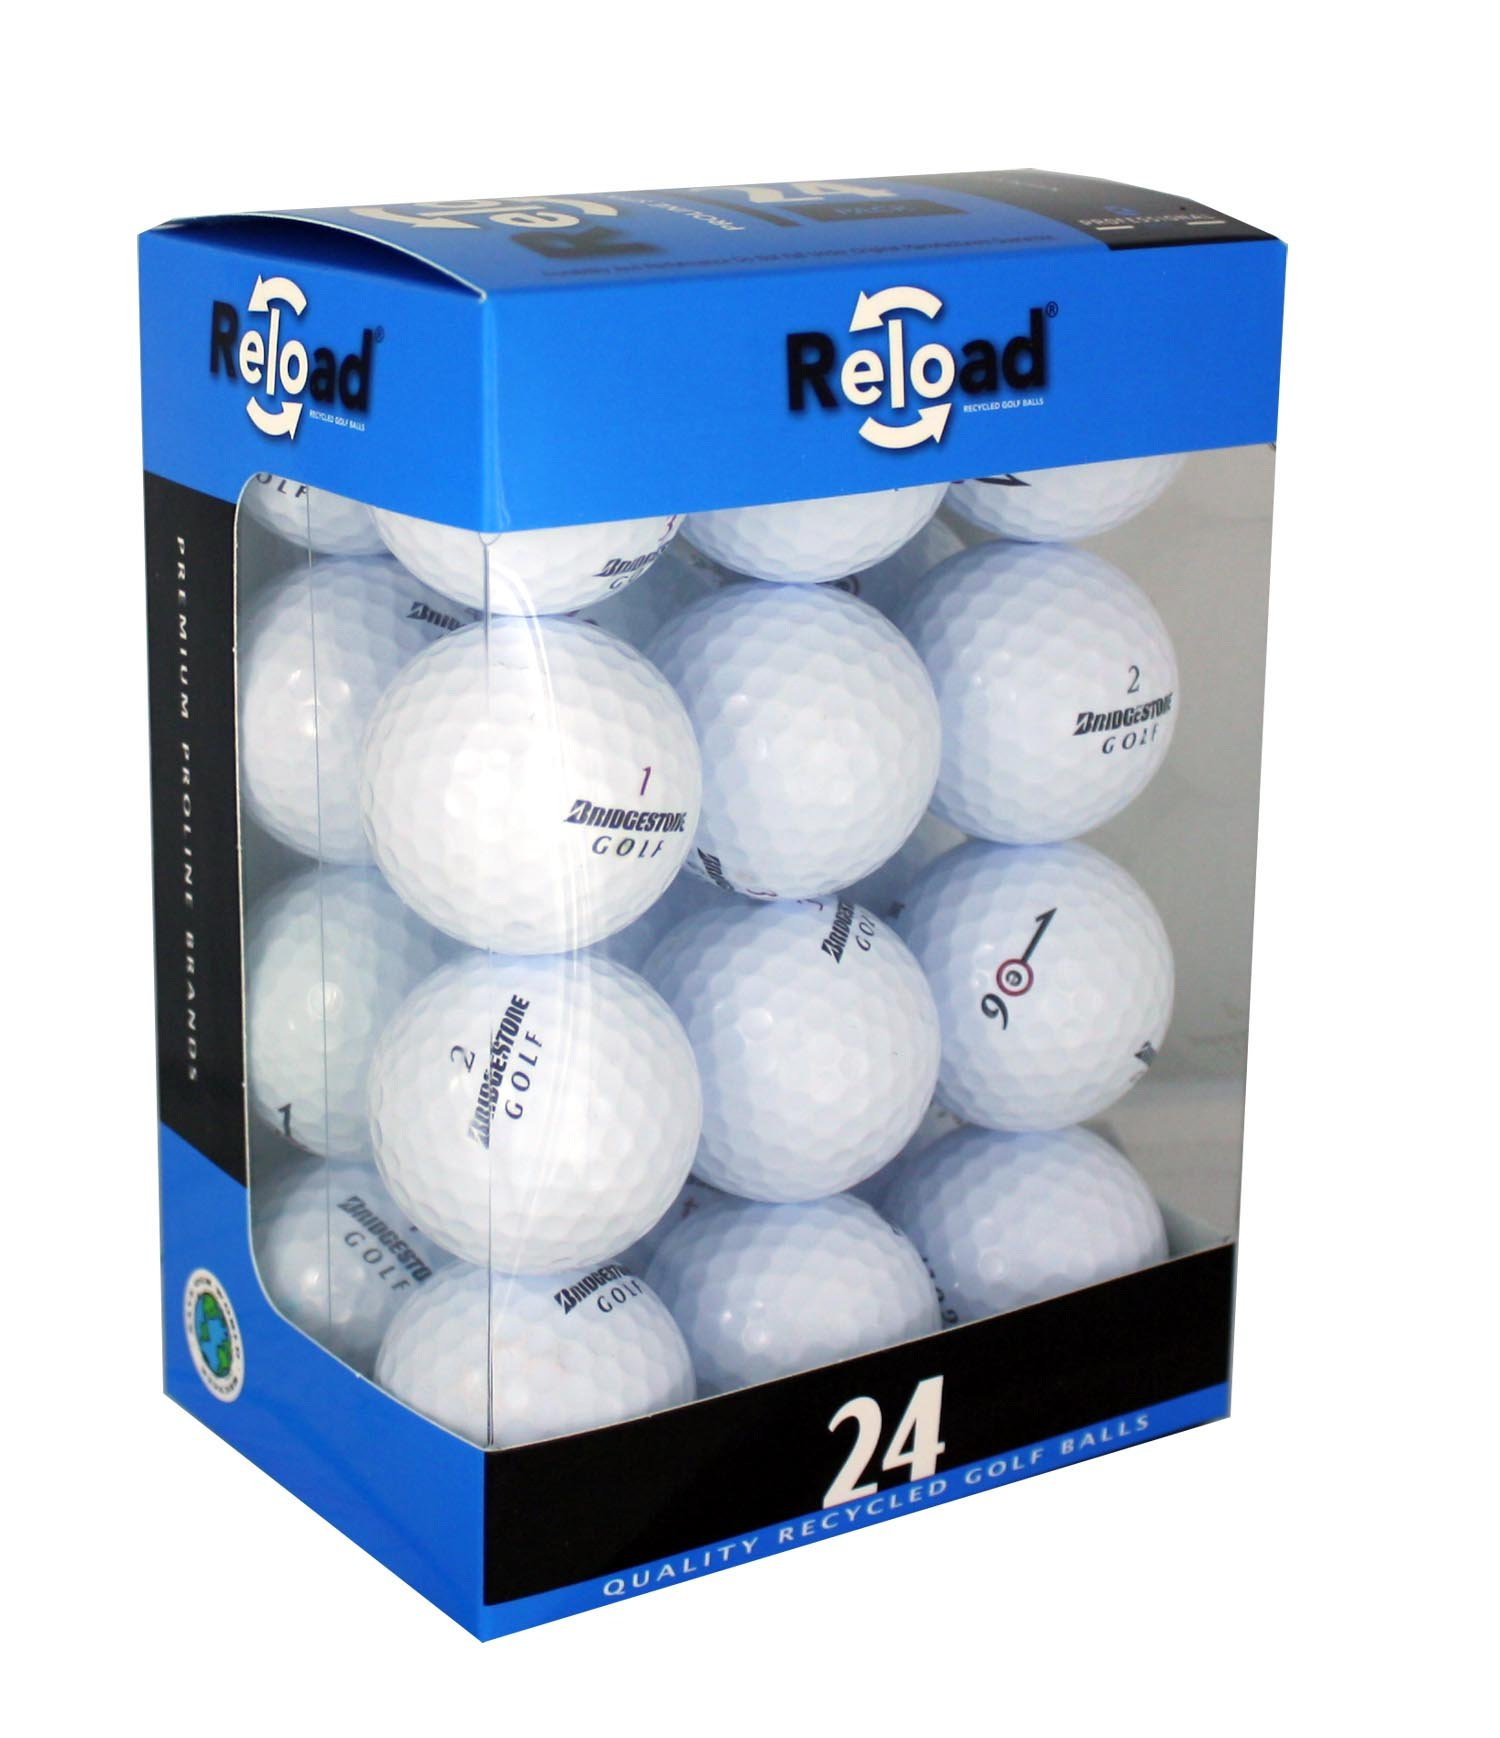 Bridgestone Reload Recycled Golf Balls (24-Pack) of Golf Balls by Bridgestone